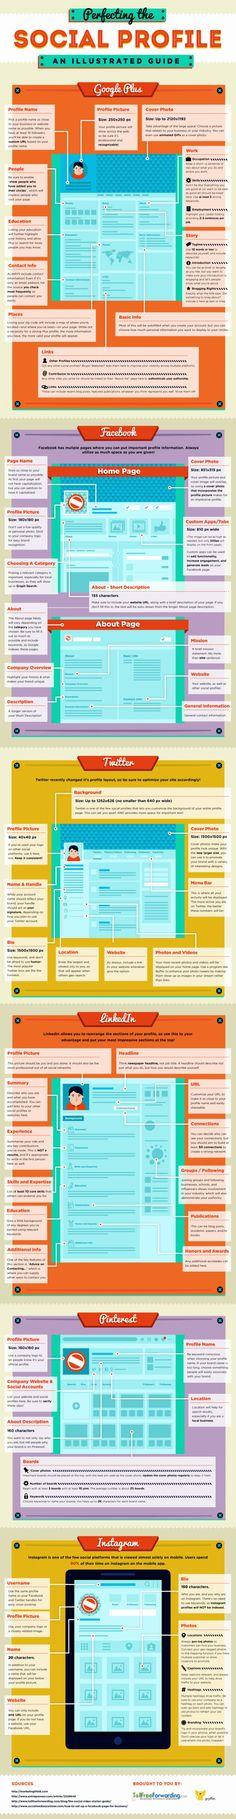 The elements of great #socialmedia profiles | Articles | Home via Ragan's PR Daily